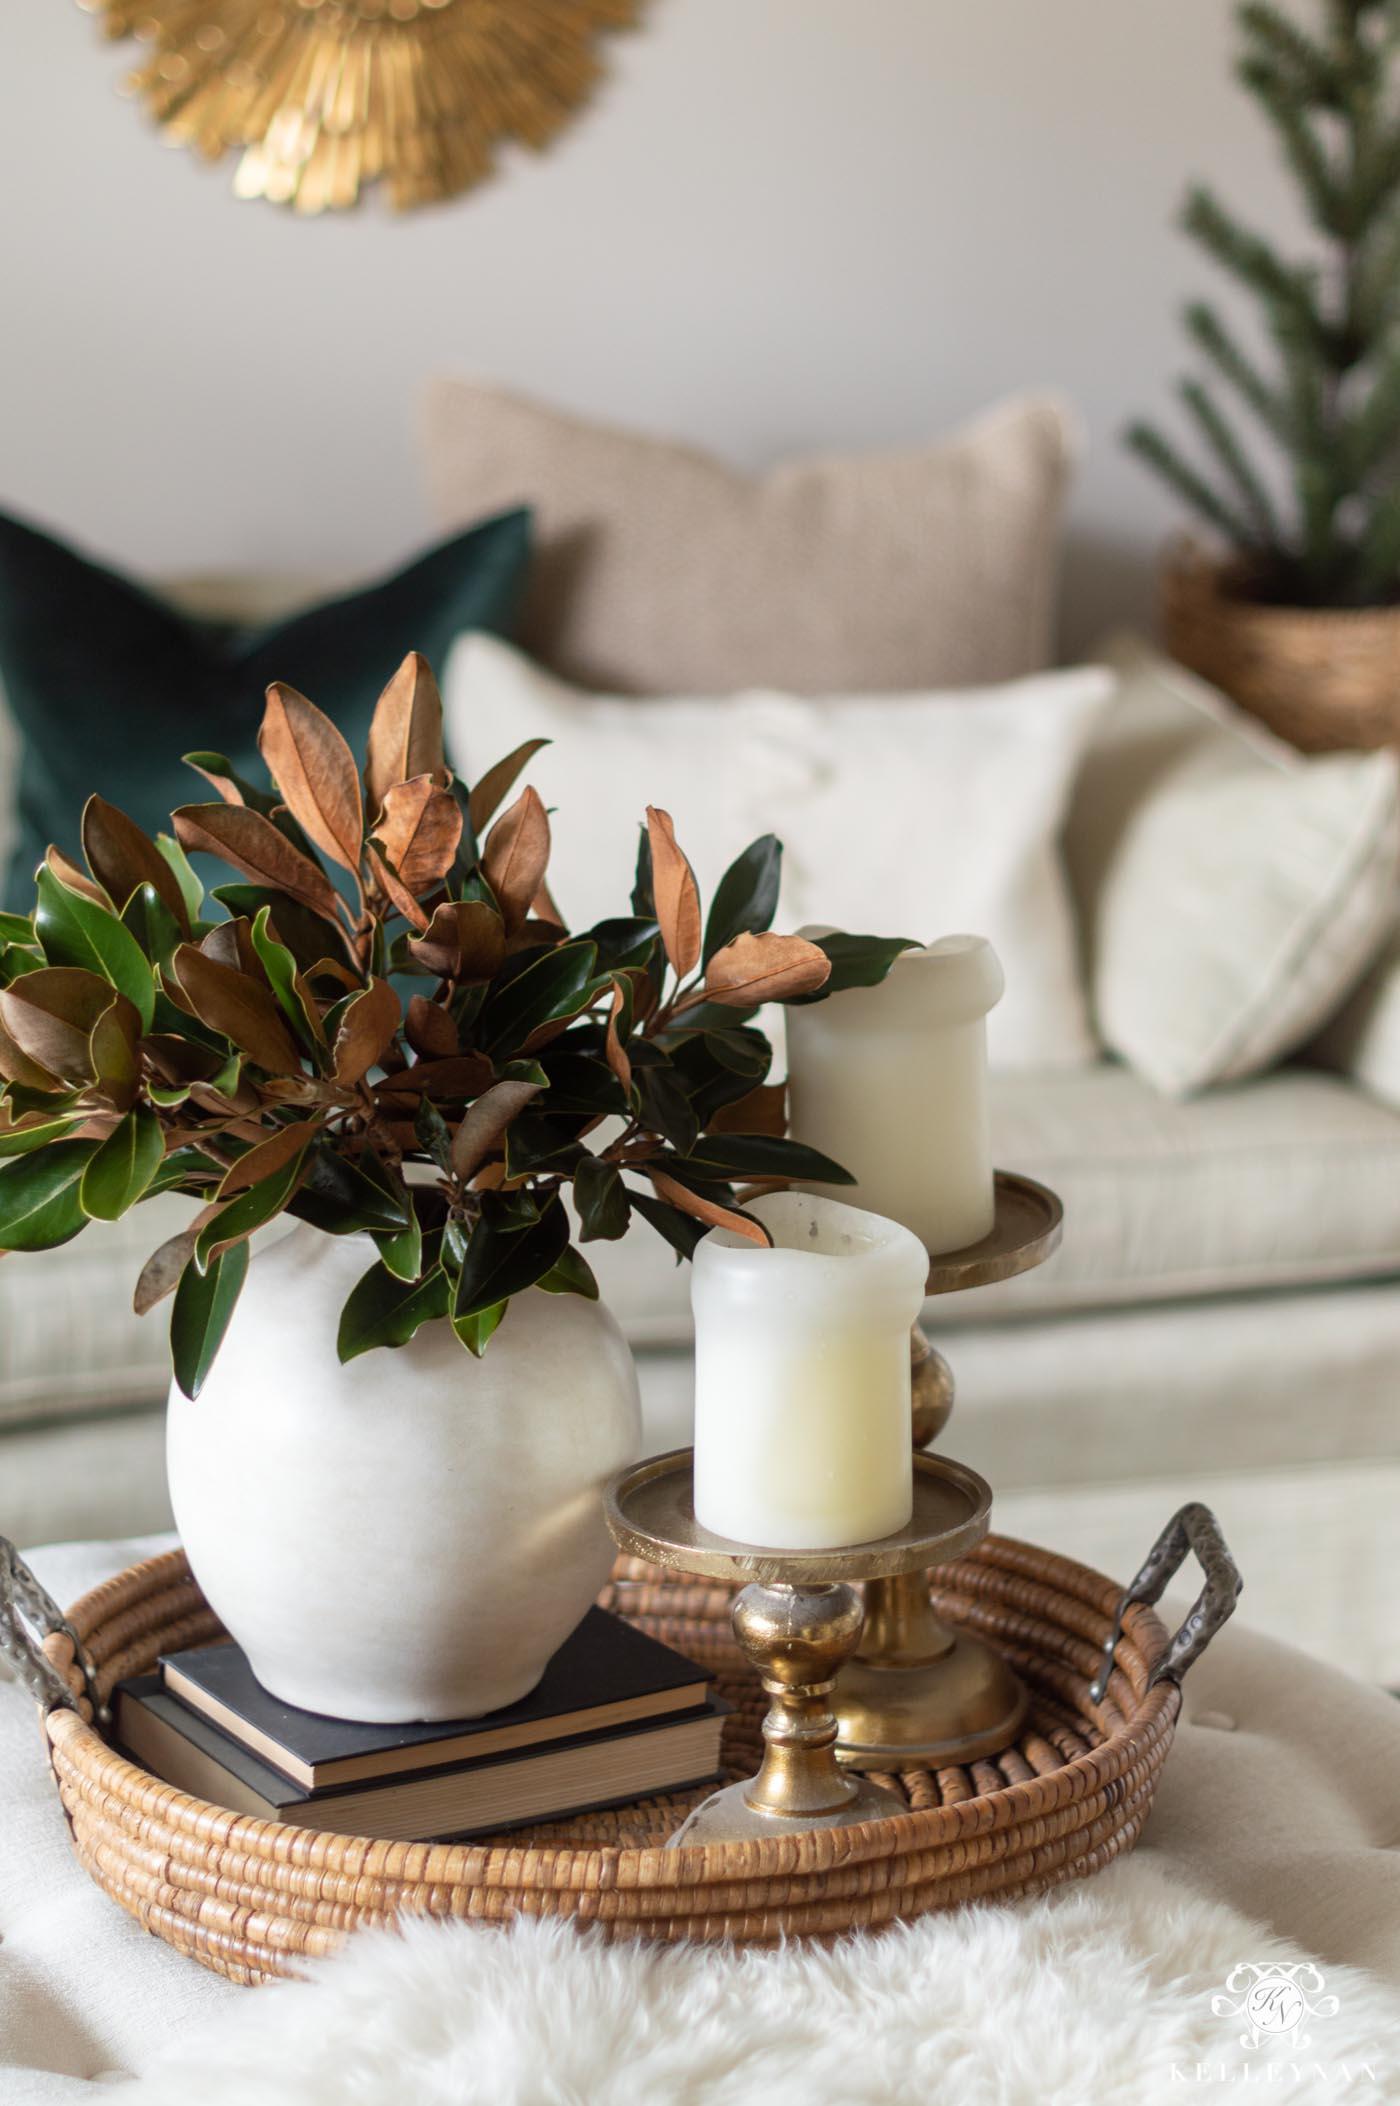 Easy Magnolia Christmas Arrangement